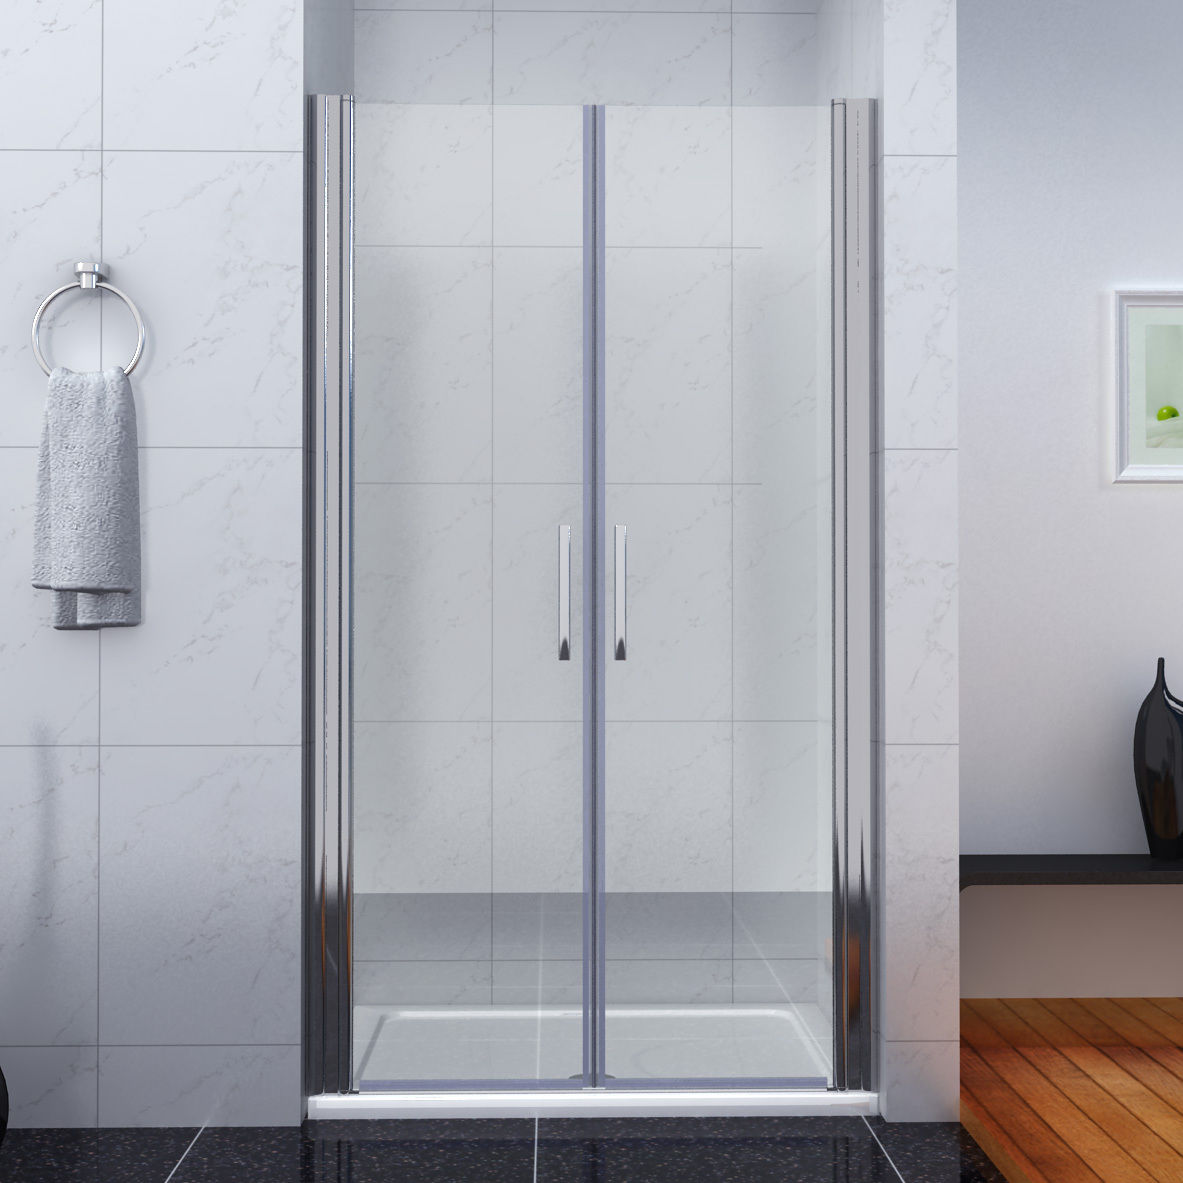 bathroom double pivot shower door enclosure 6mm glass screen cubicle